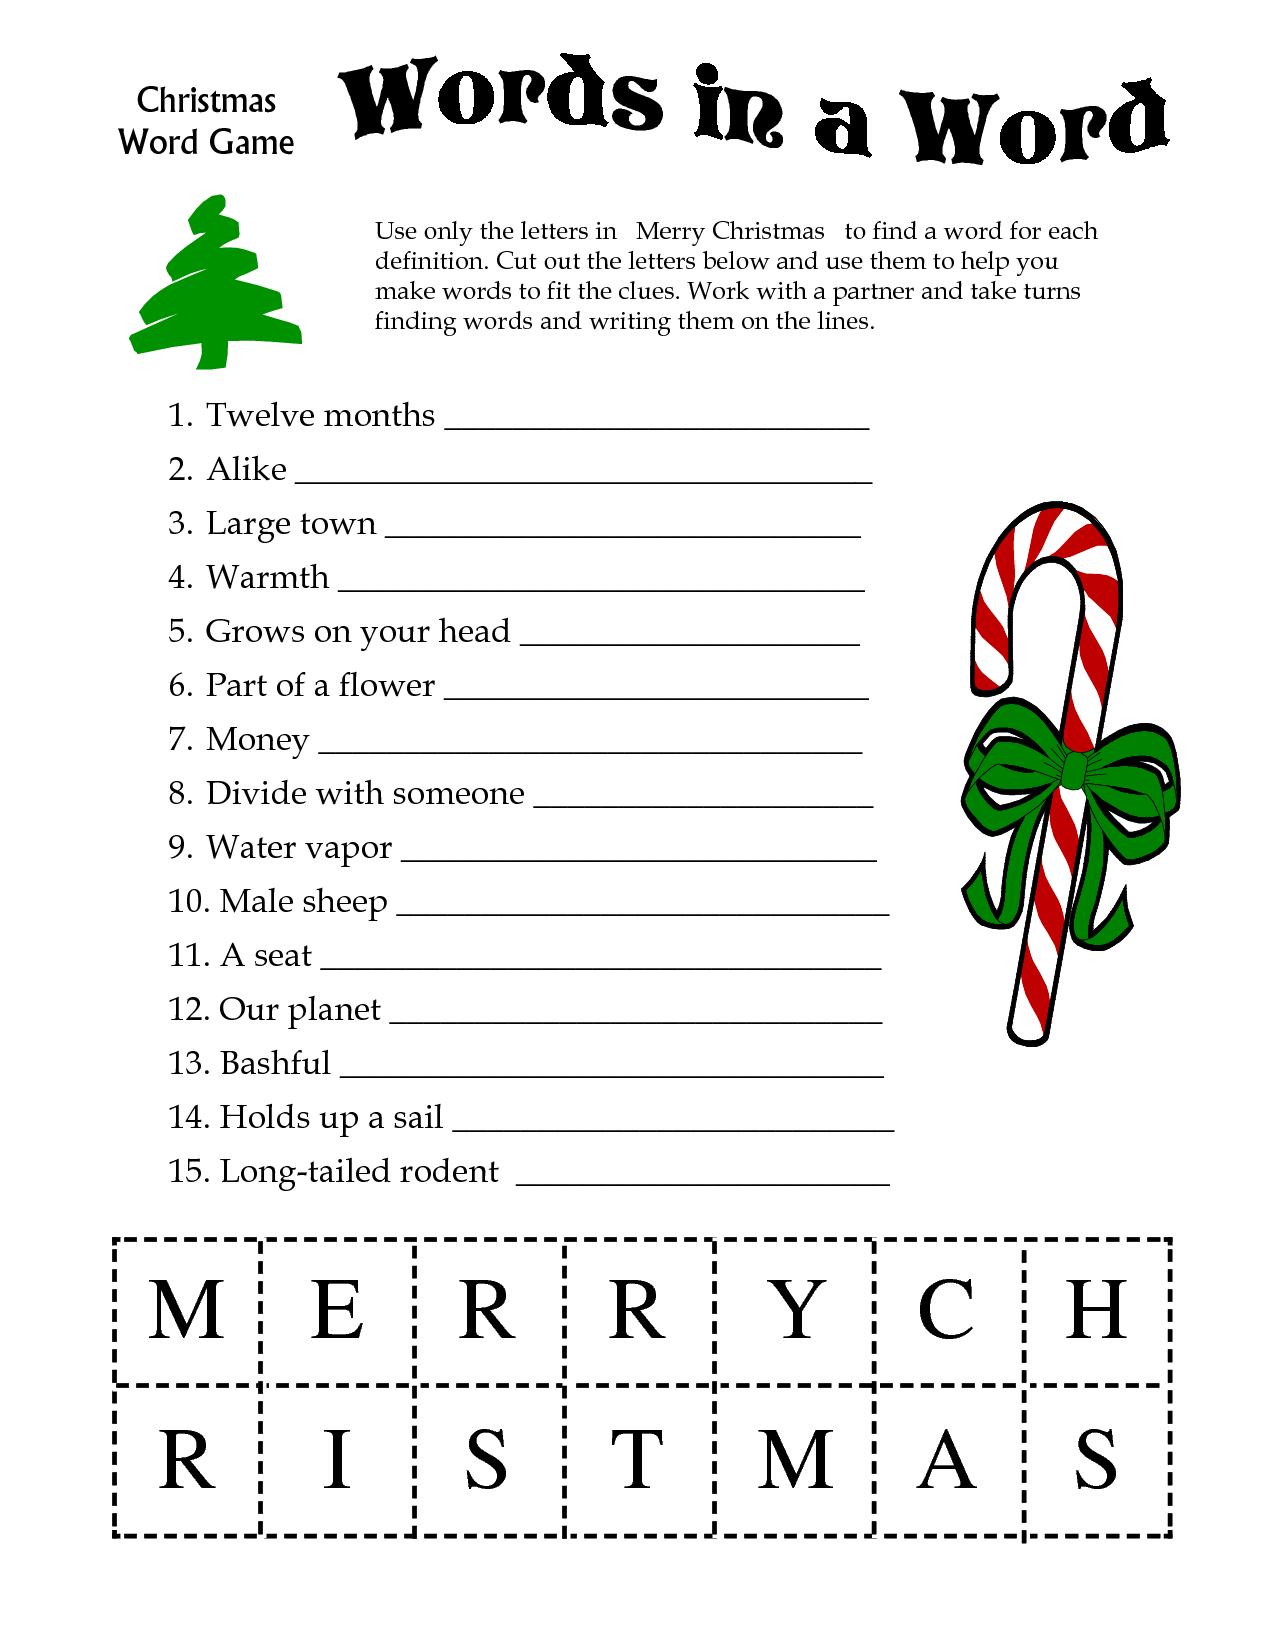 Declarative image with regard to printable christmas word games